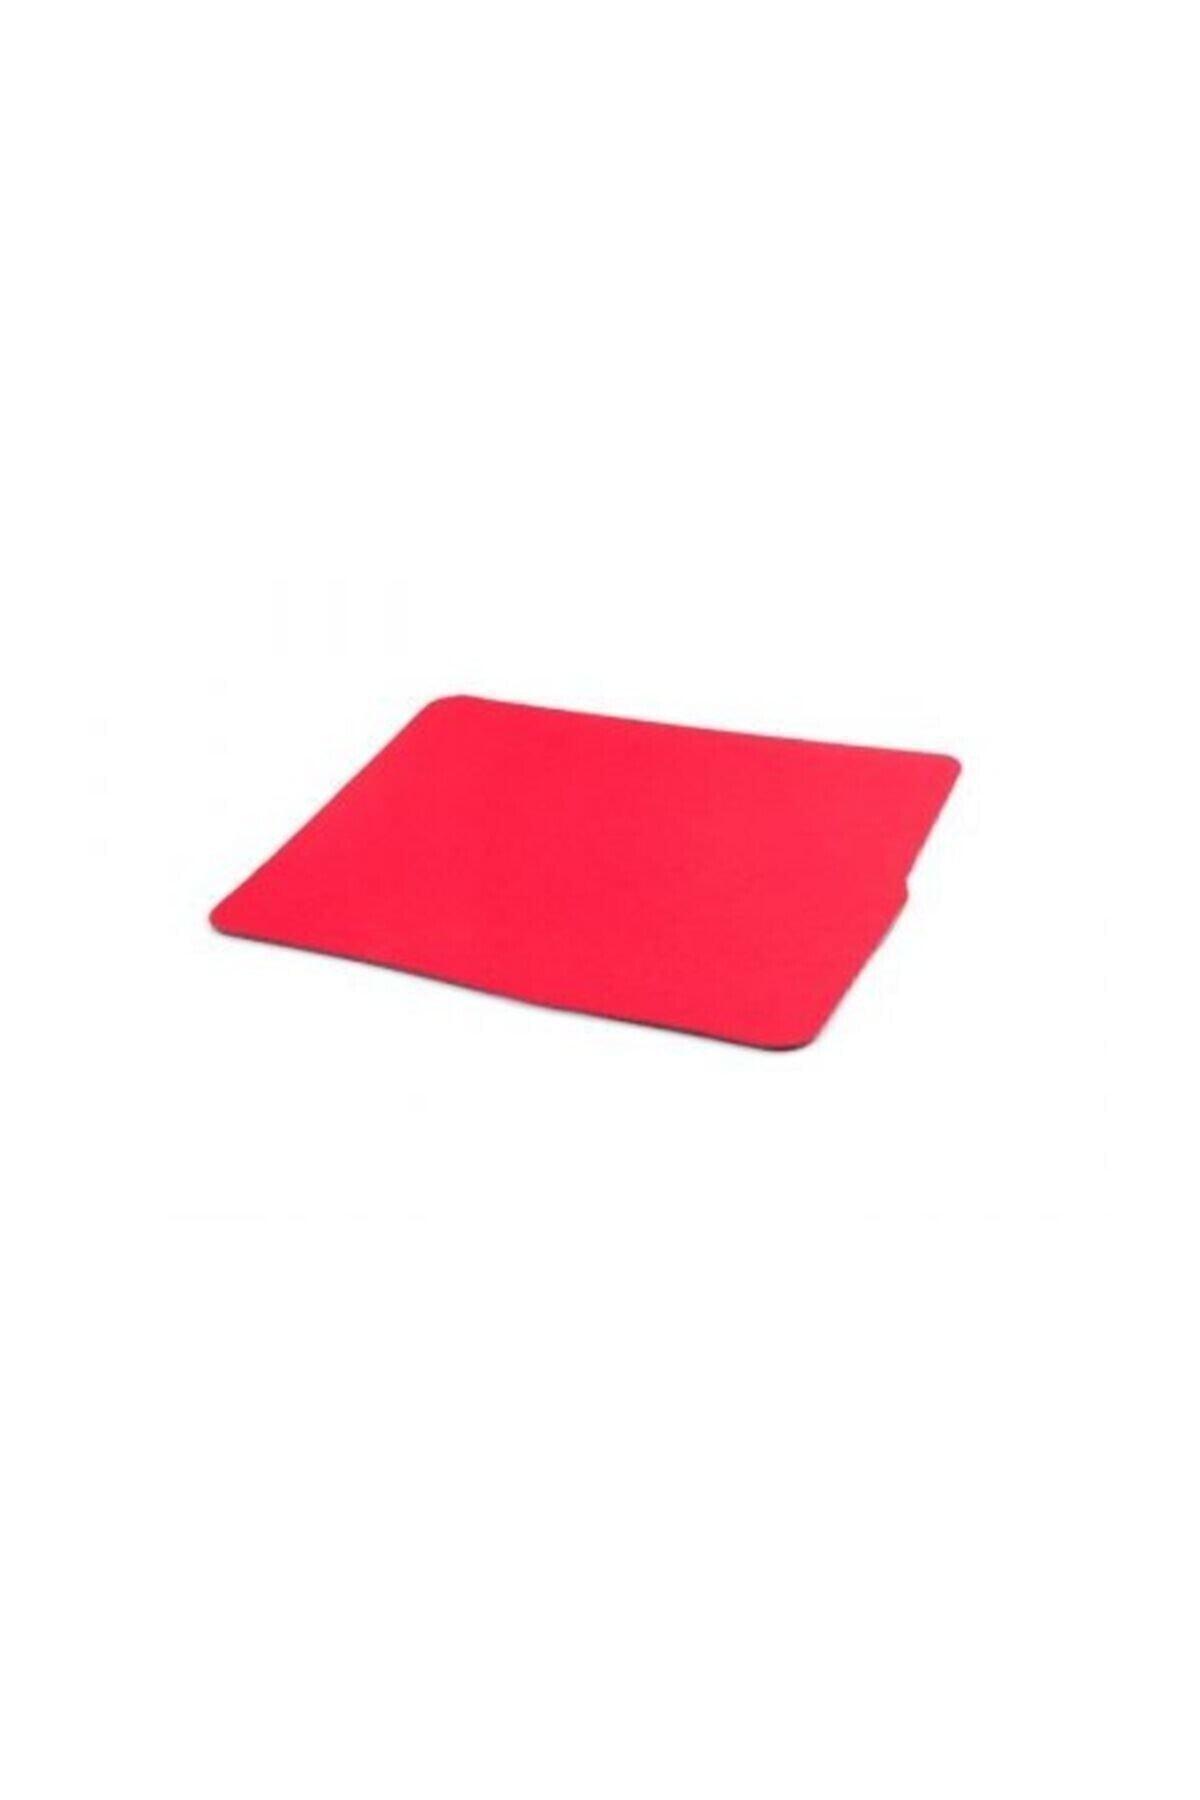 ADDISON 300141 Kırmızı Mouse Pad 22 Cm X 18 Cm 1